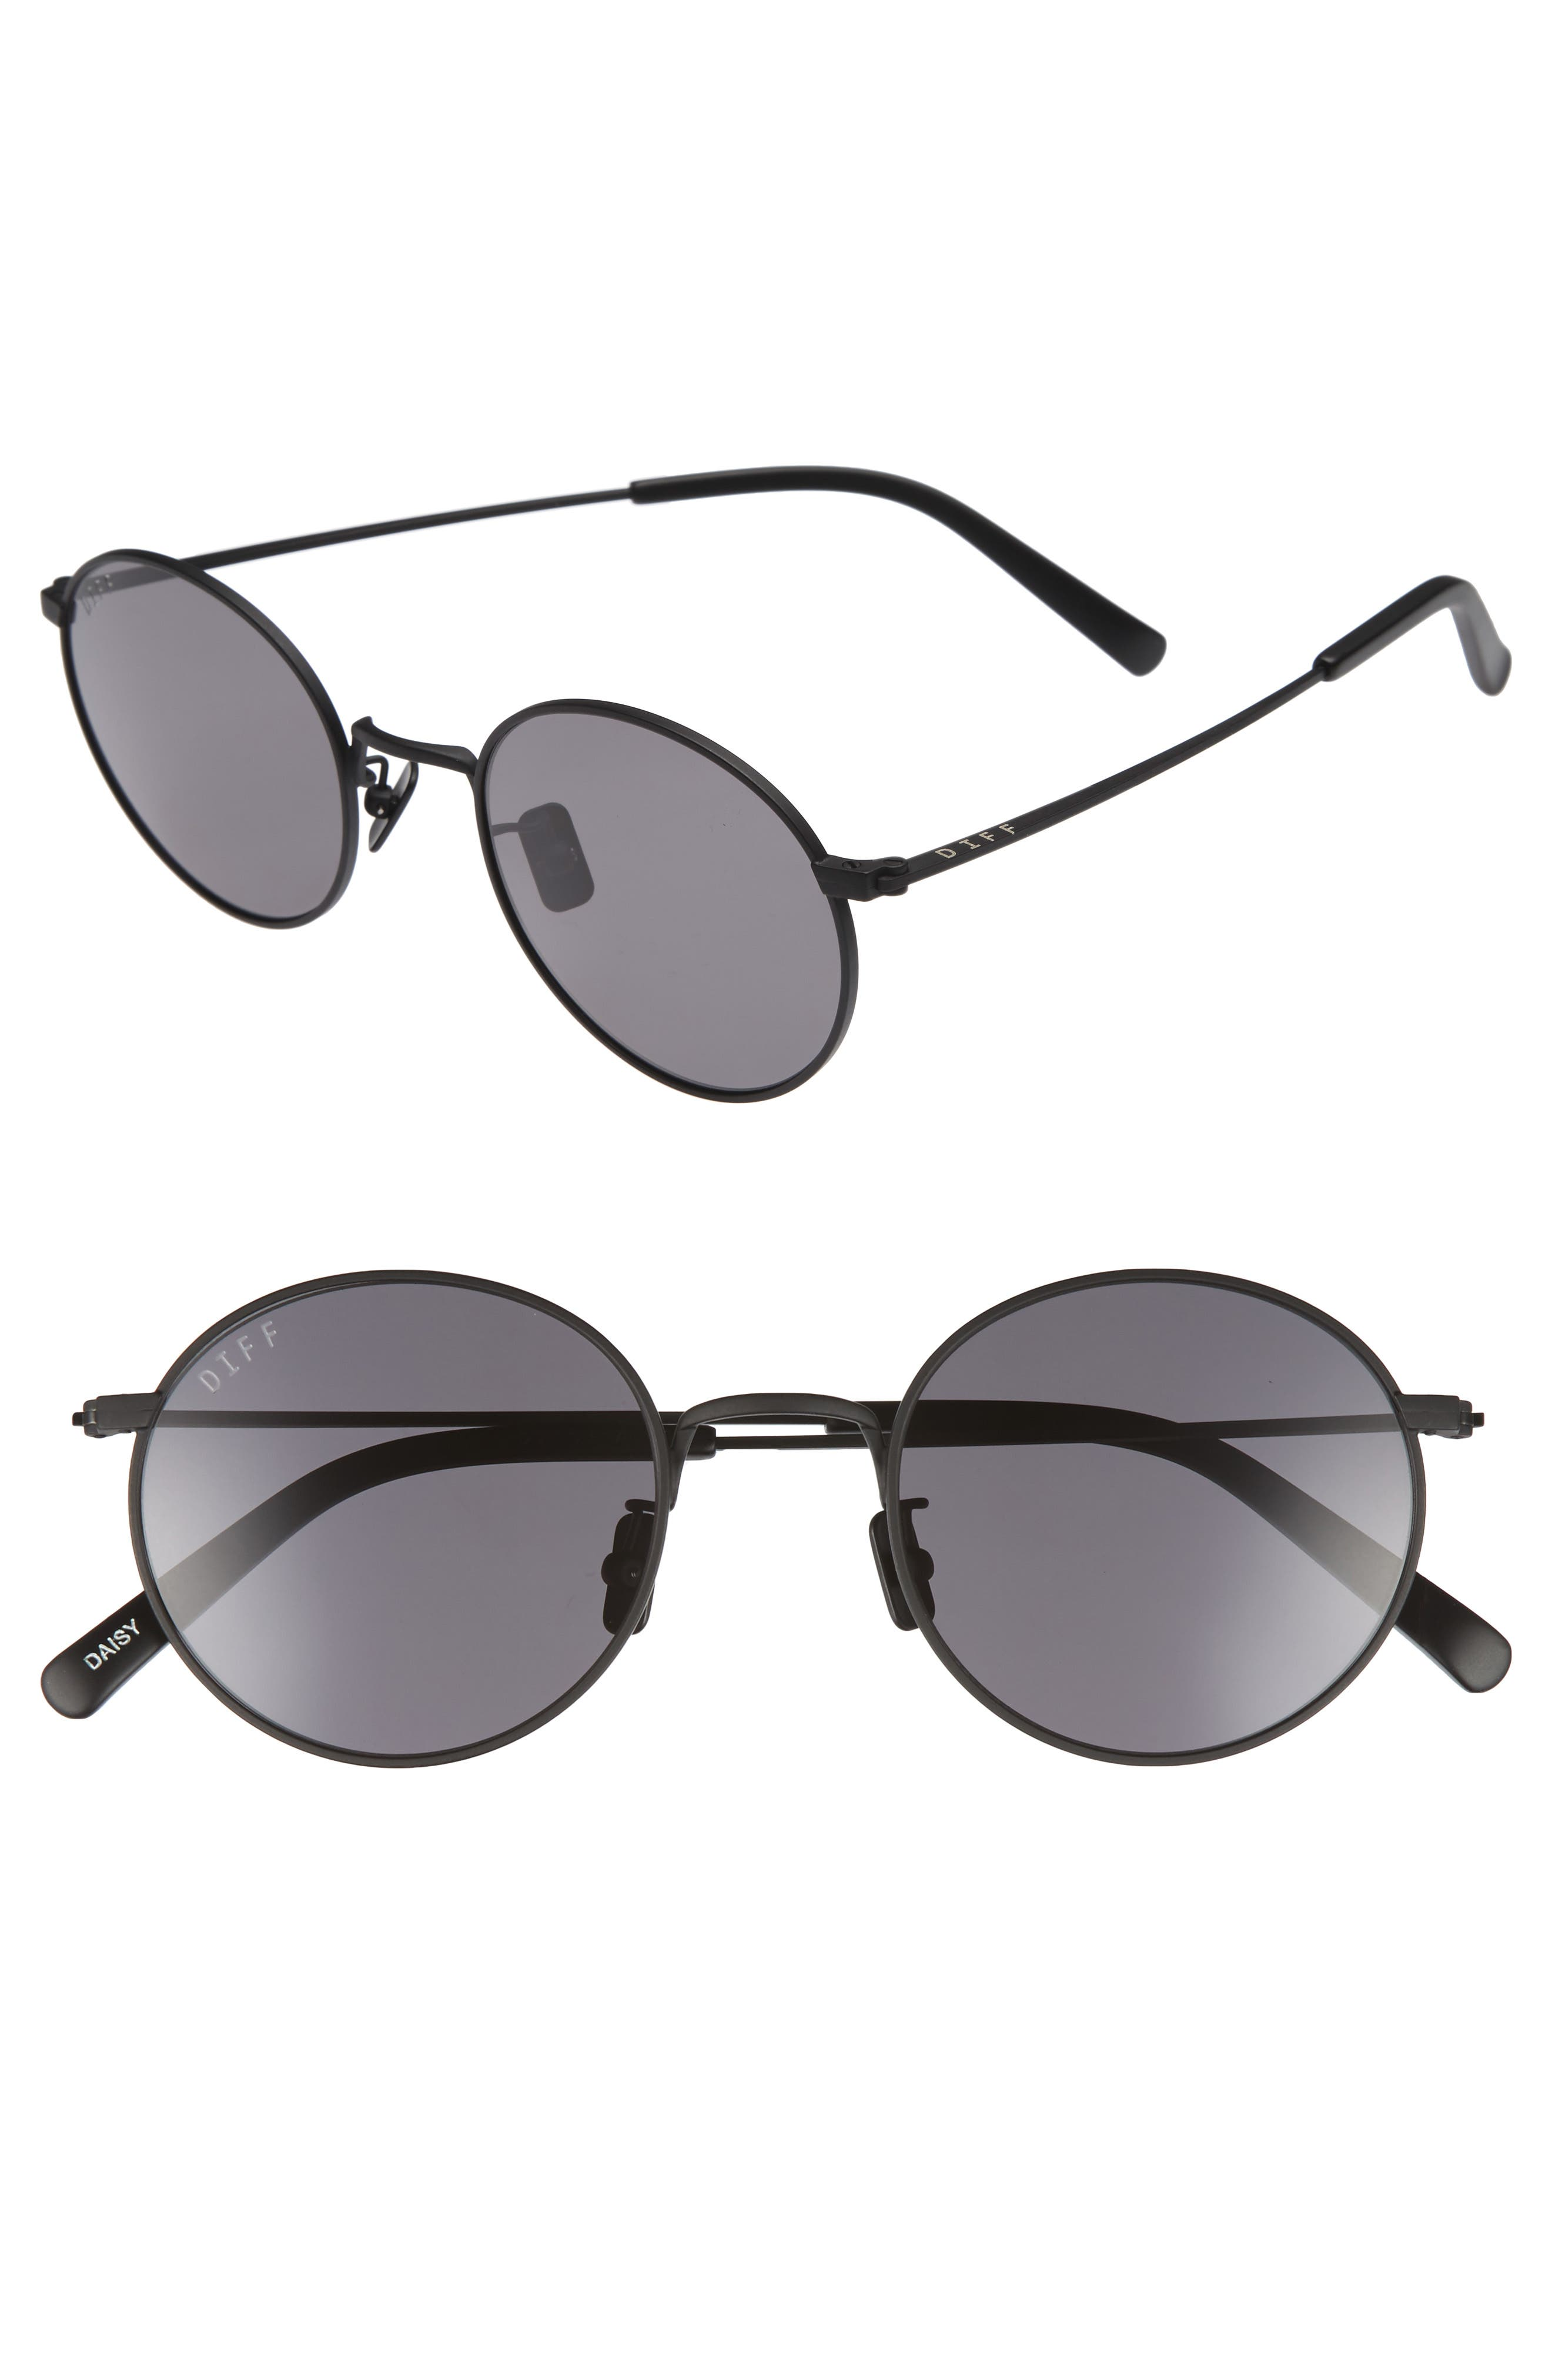 Daisy 51mm Round Sunglasses,                         Main,                         color, Matte Black/ Grey